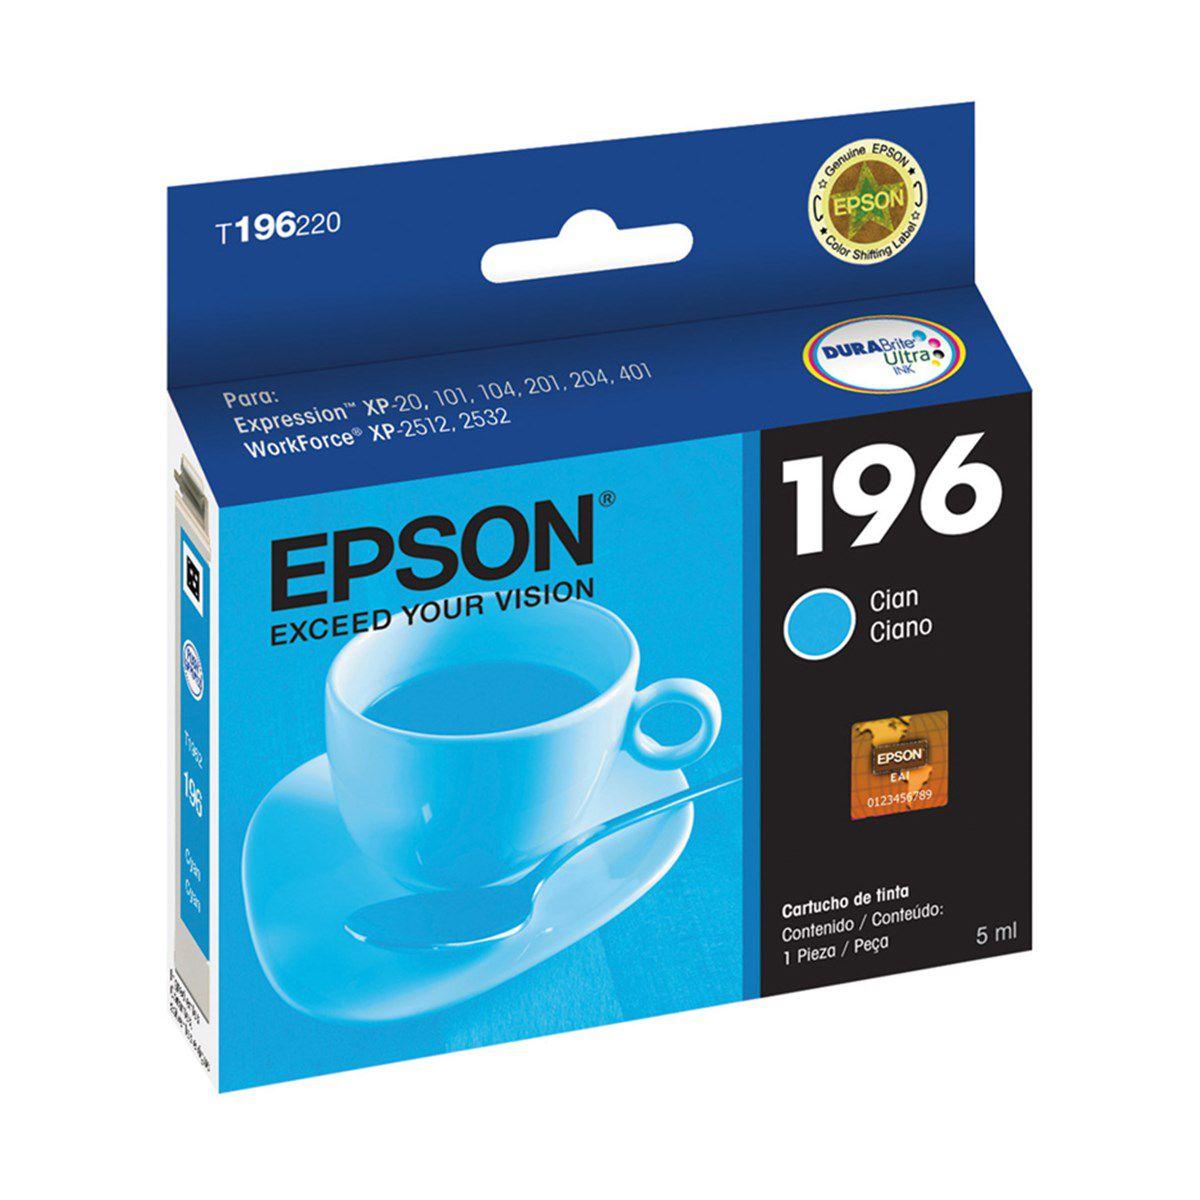 Cartucho Epson Ciano T196220 T196 196 para XP-204 XP-214 XP-401 XP-411 WF-2512 WF-2532